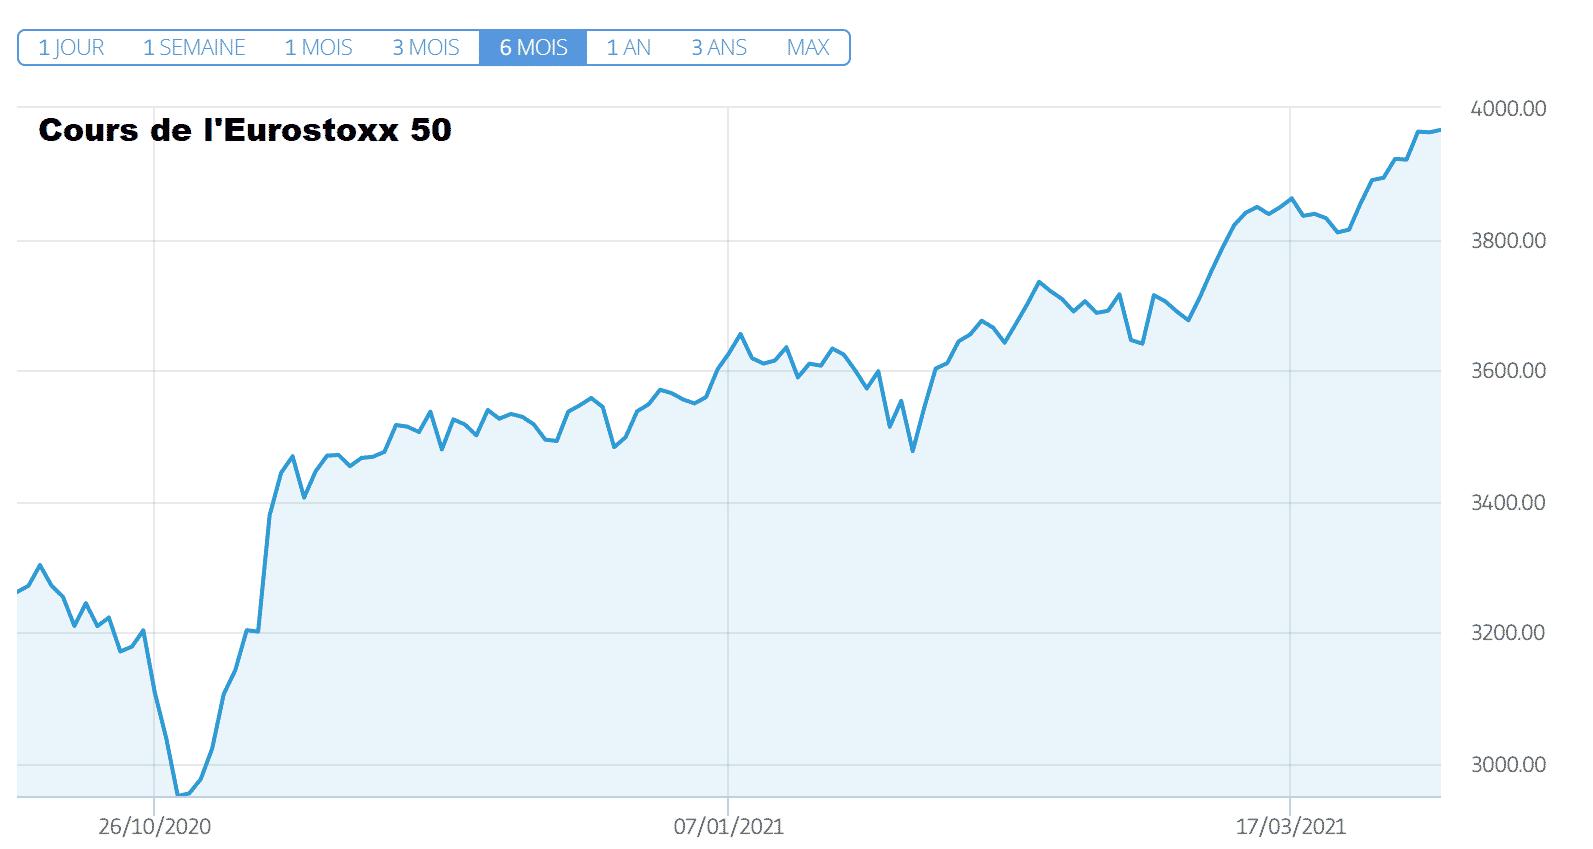 Engie en tête d'un Eurostoxx 50 en chute mercredi 7 avril 2021